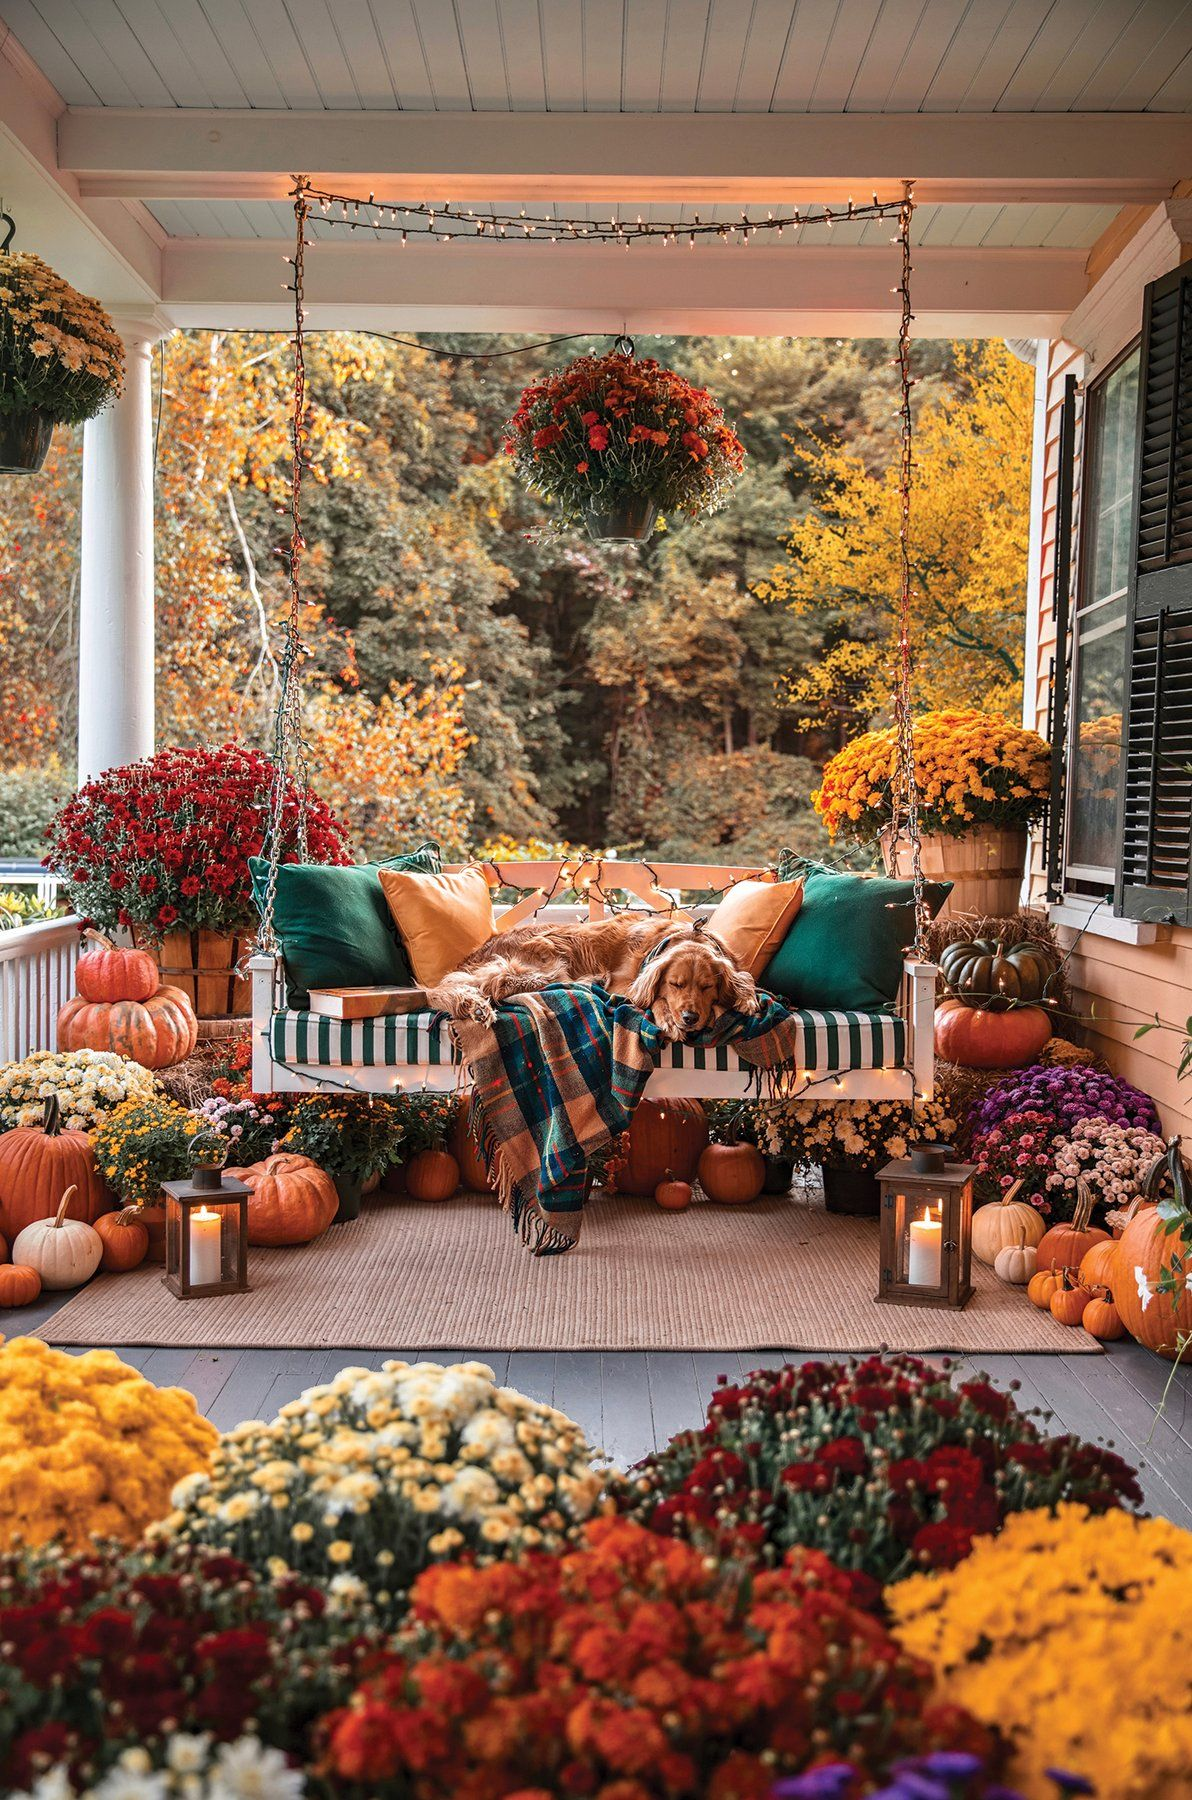 Cozy Autumn Porch Puzzle Cozy Autumn Porch Puzzle